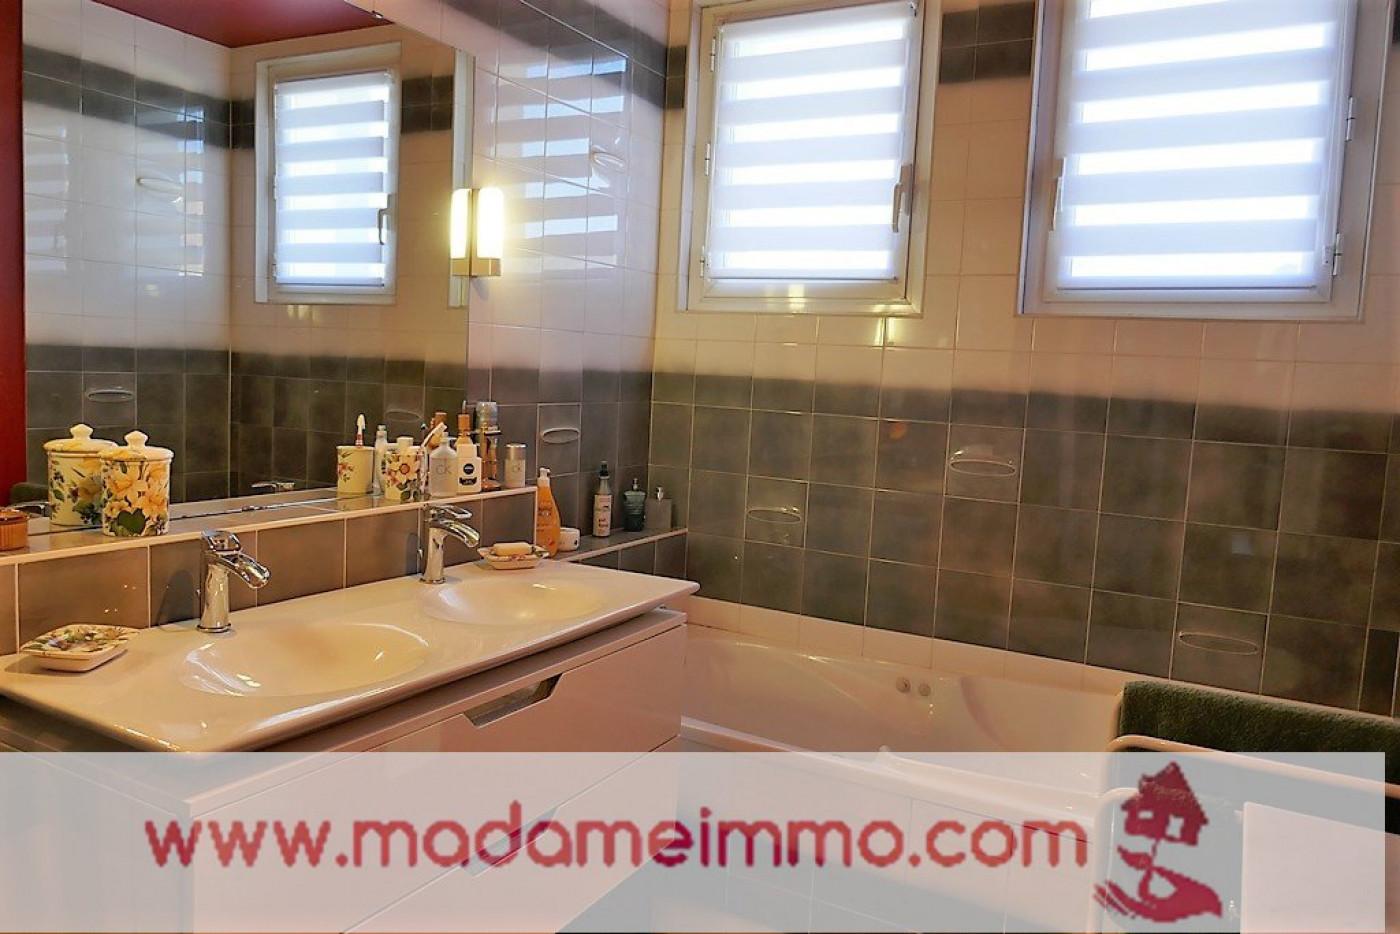 A vendre Lourdes 650031425 Madame immo